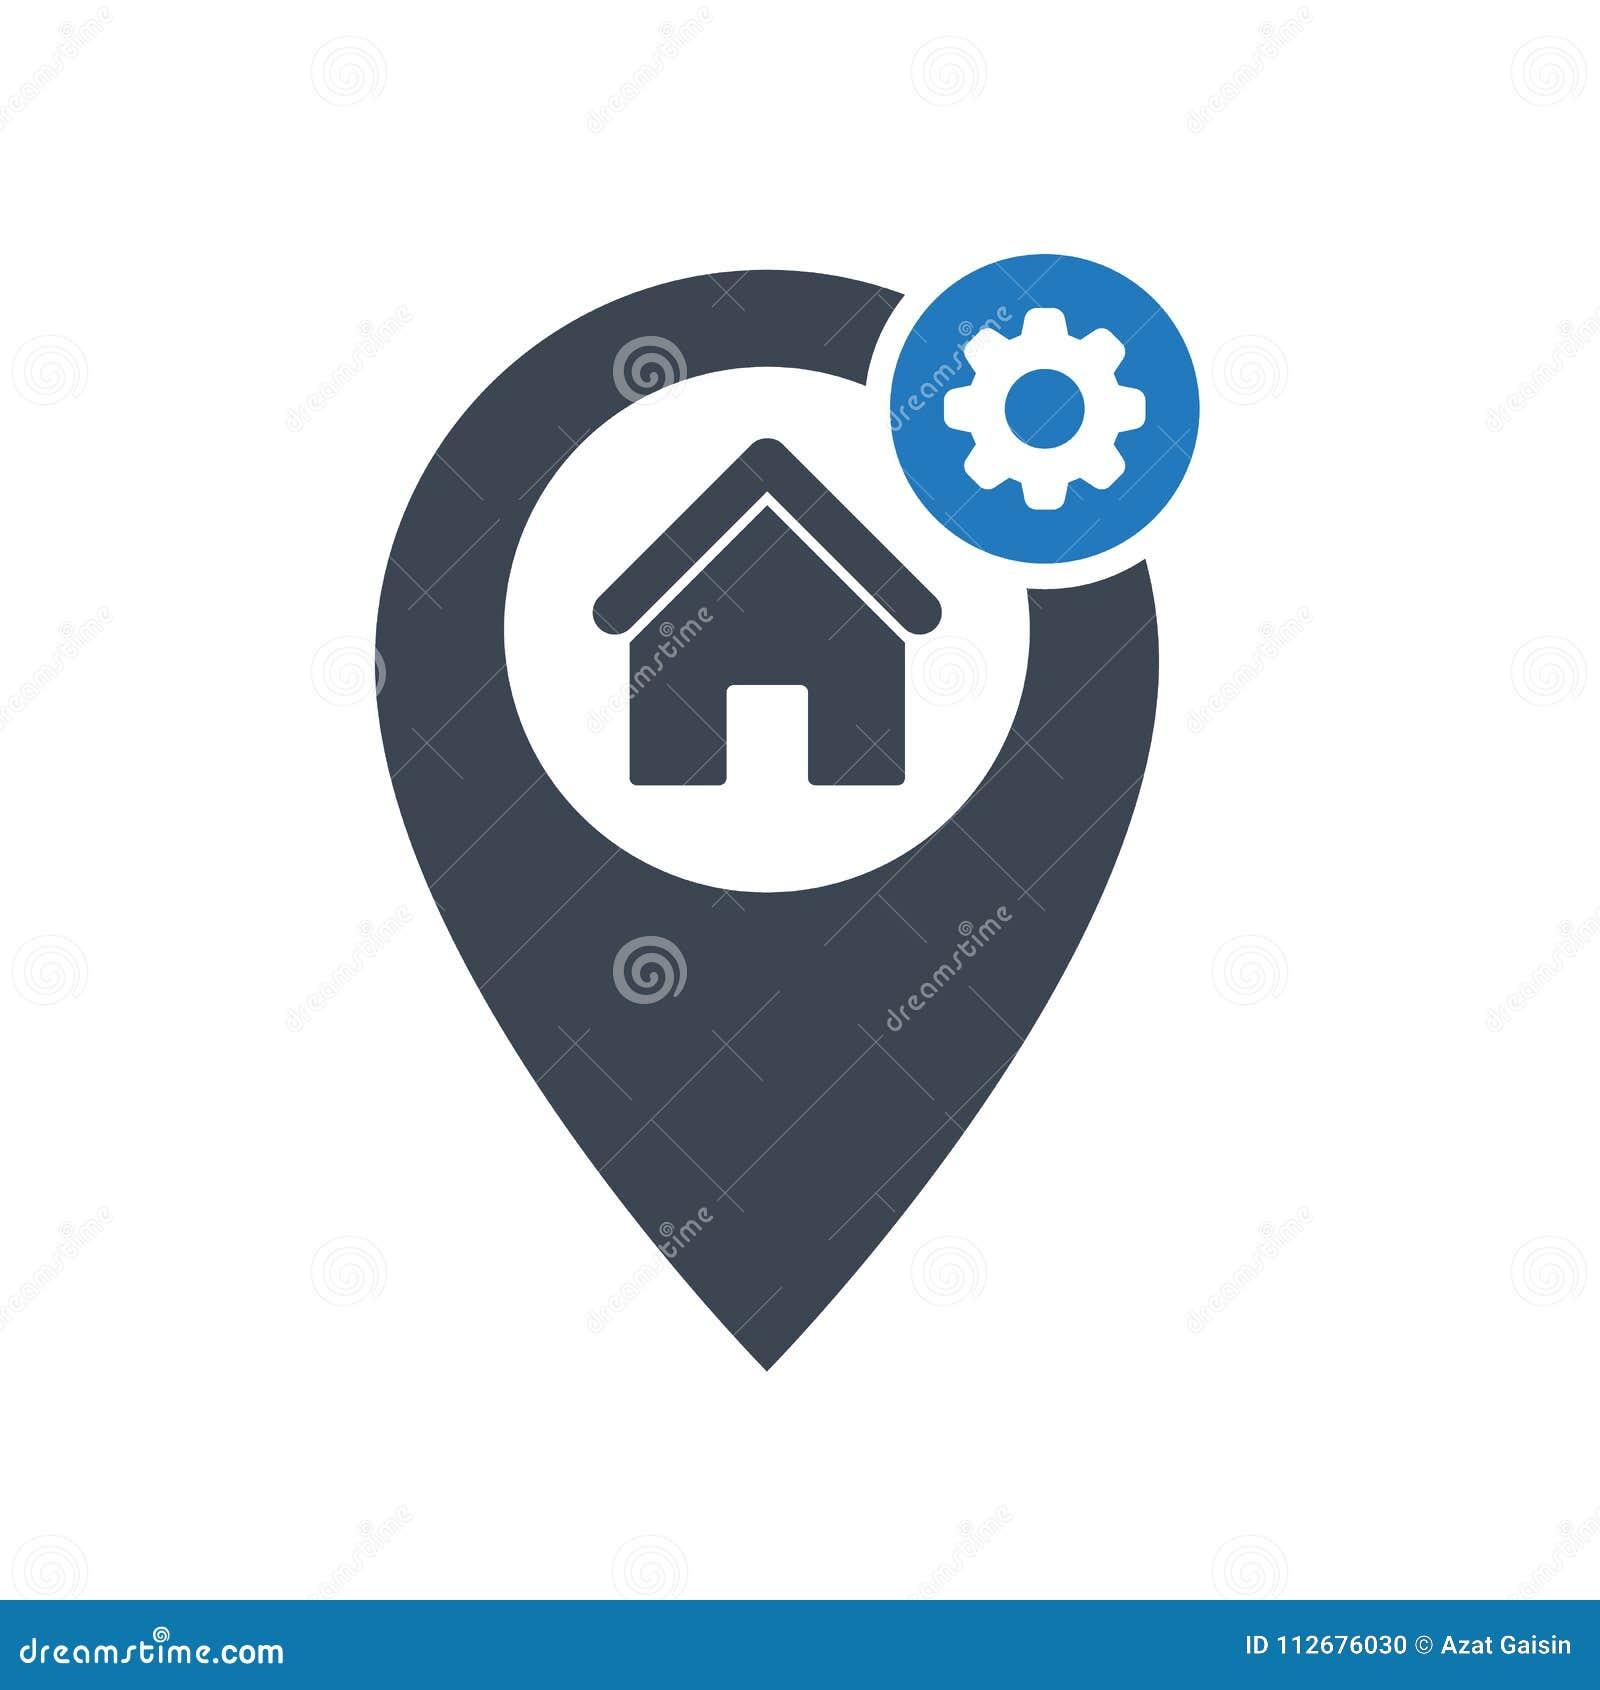 Address icon with settings sign. Address icon and customize, setup, manage, process symbol